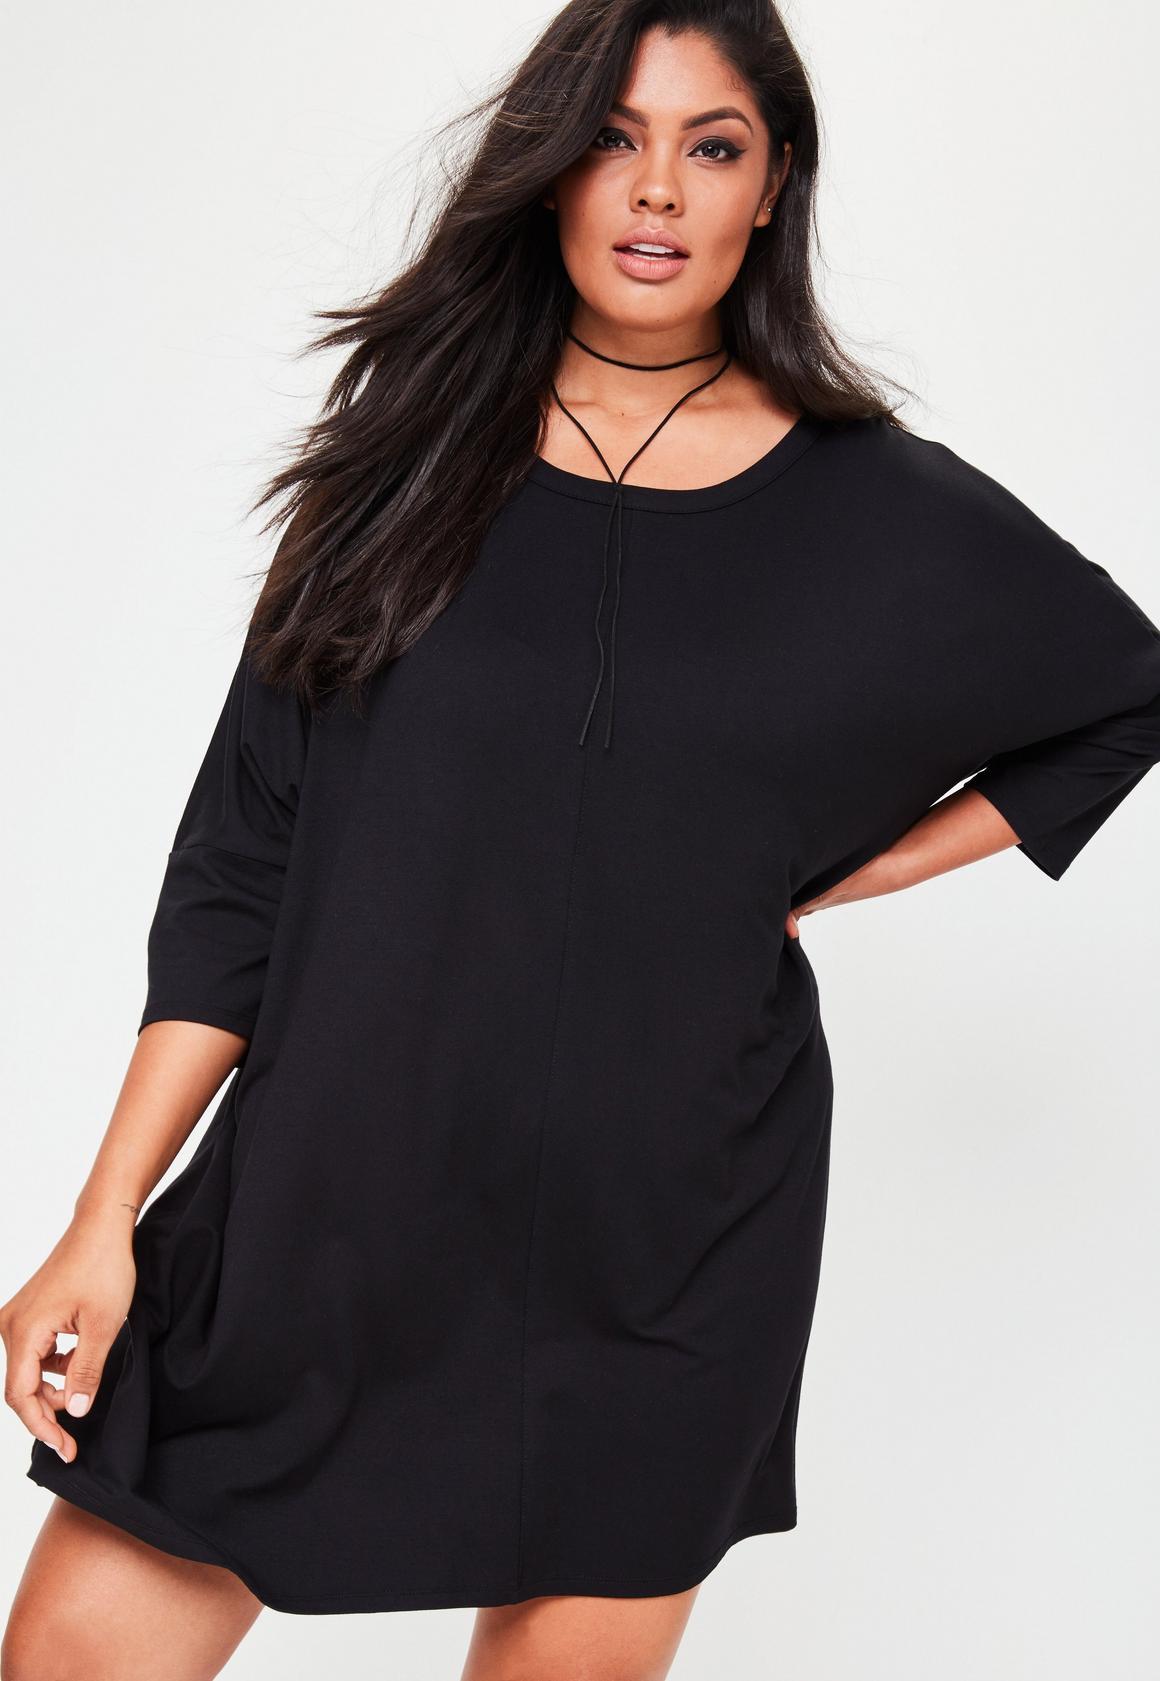 Oversized black t shirt - Curve Black Oversized T Shirt Dress Previous Next